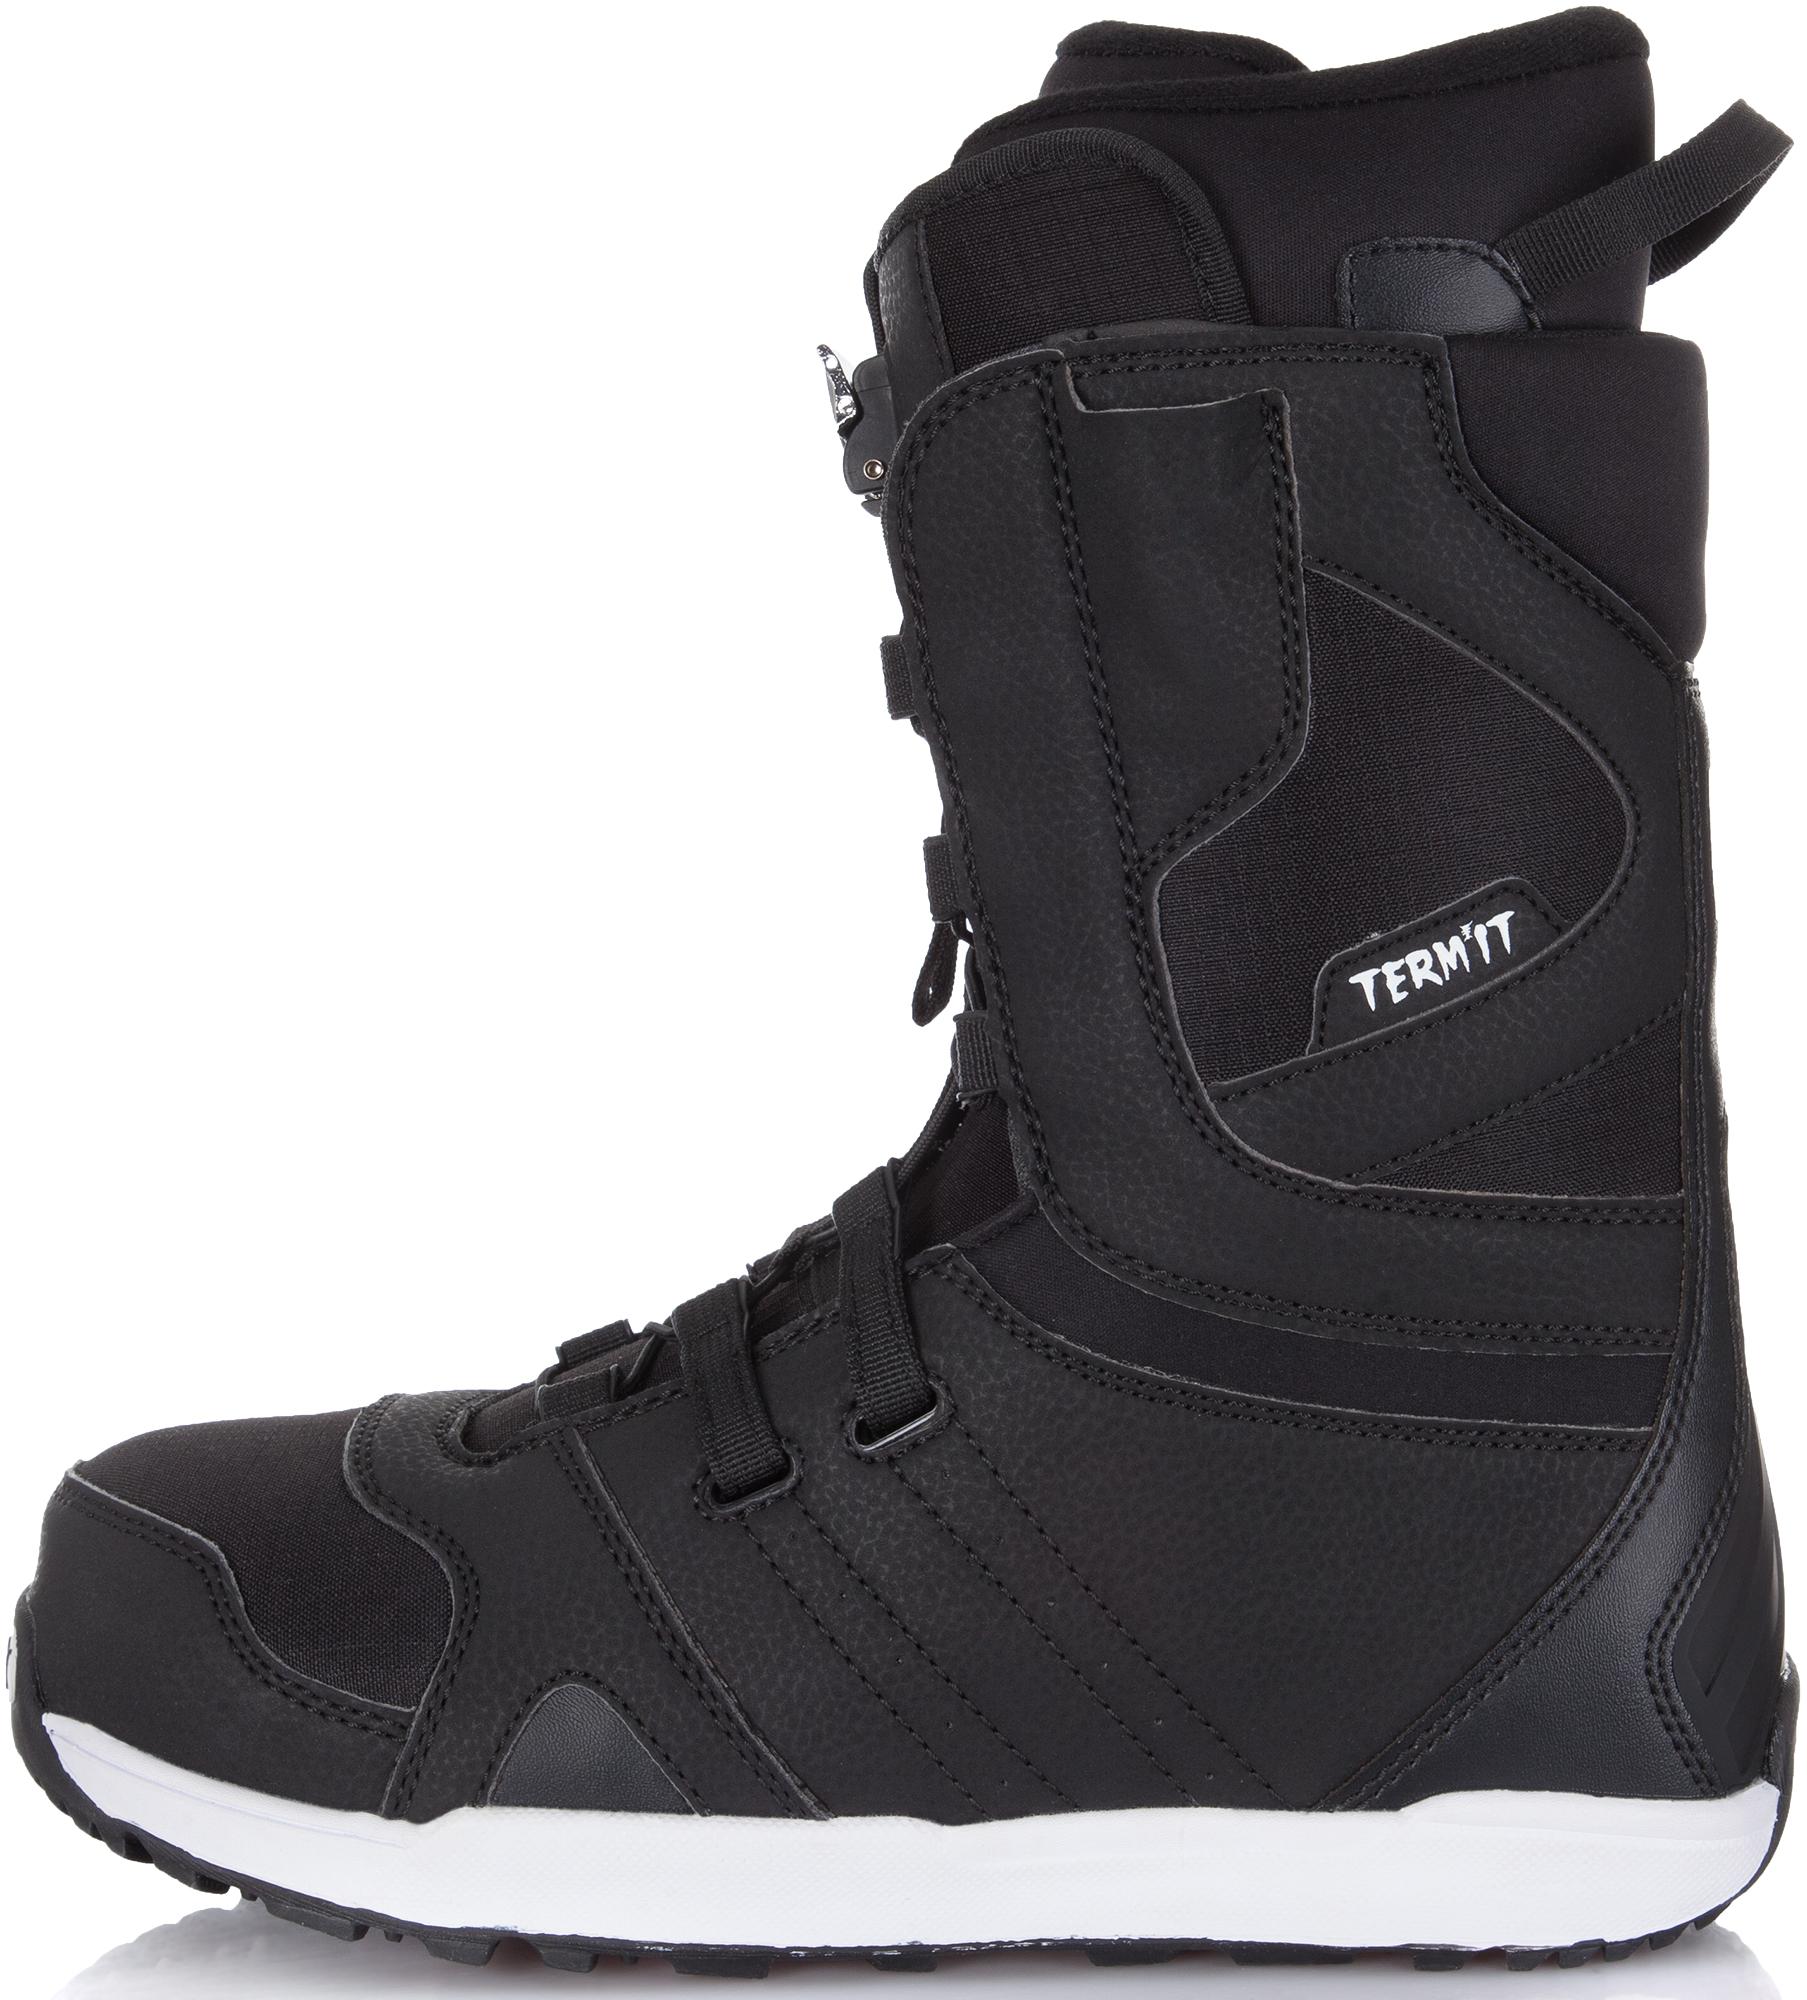 Termit Ботинки сноубордические Trend, размер 43,5